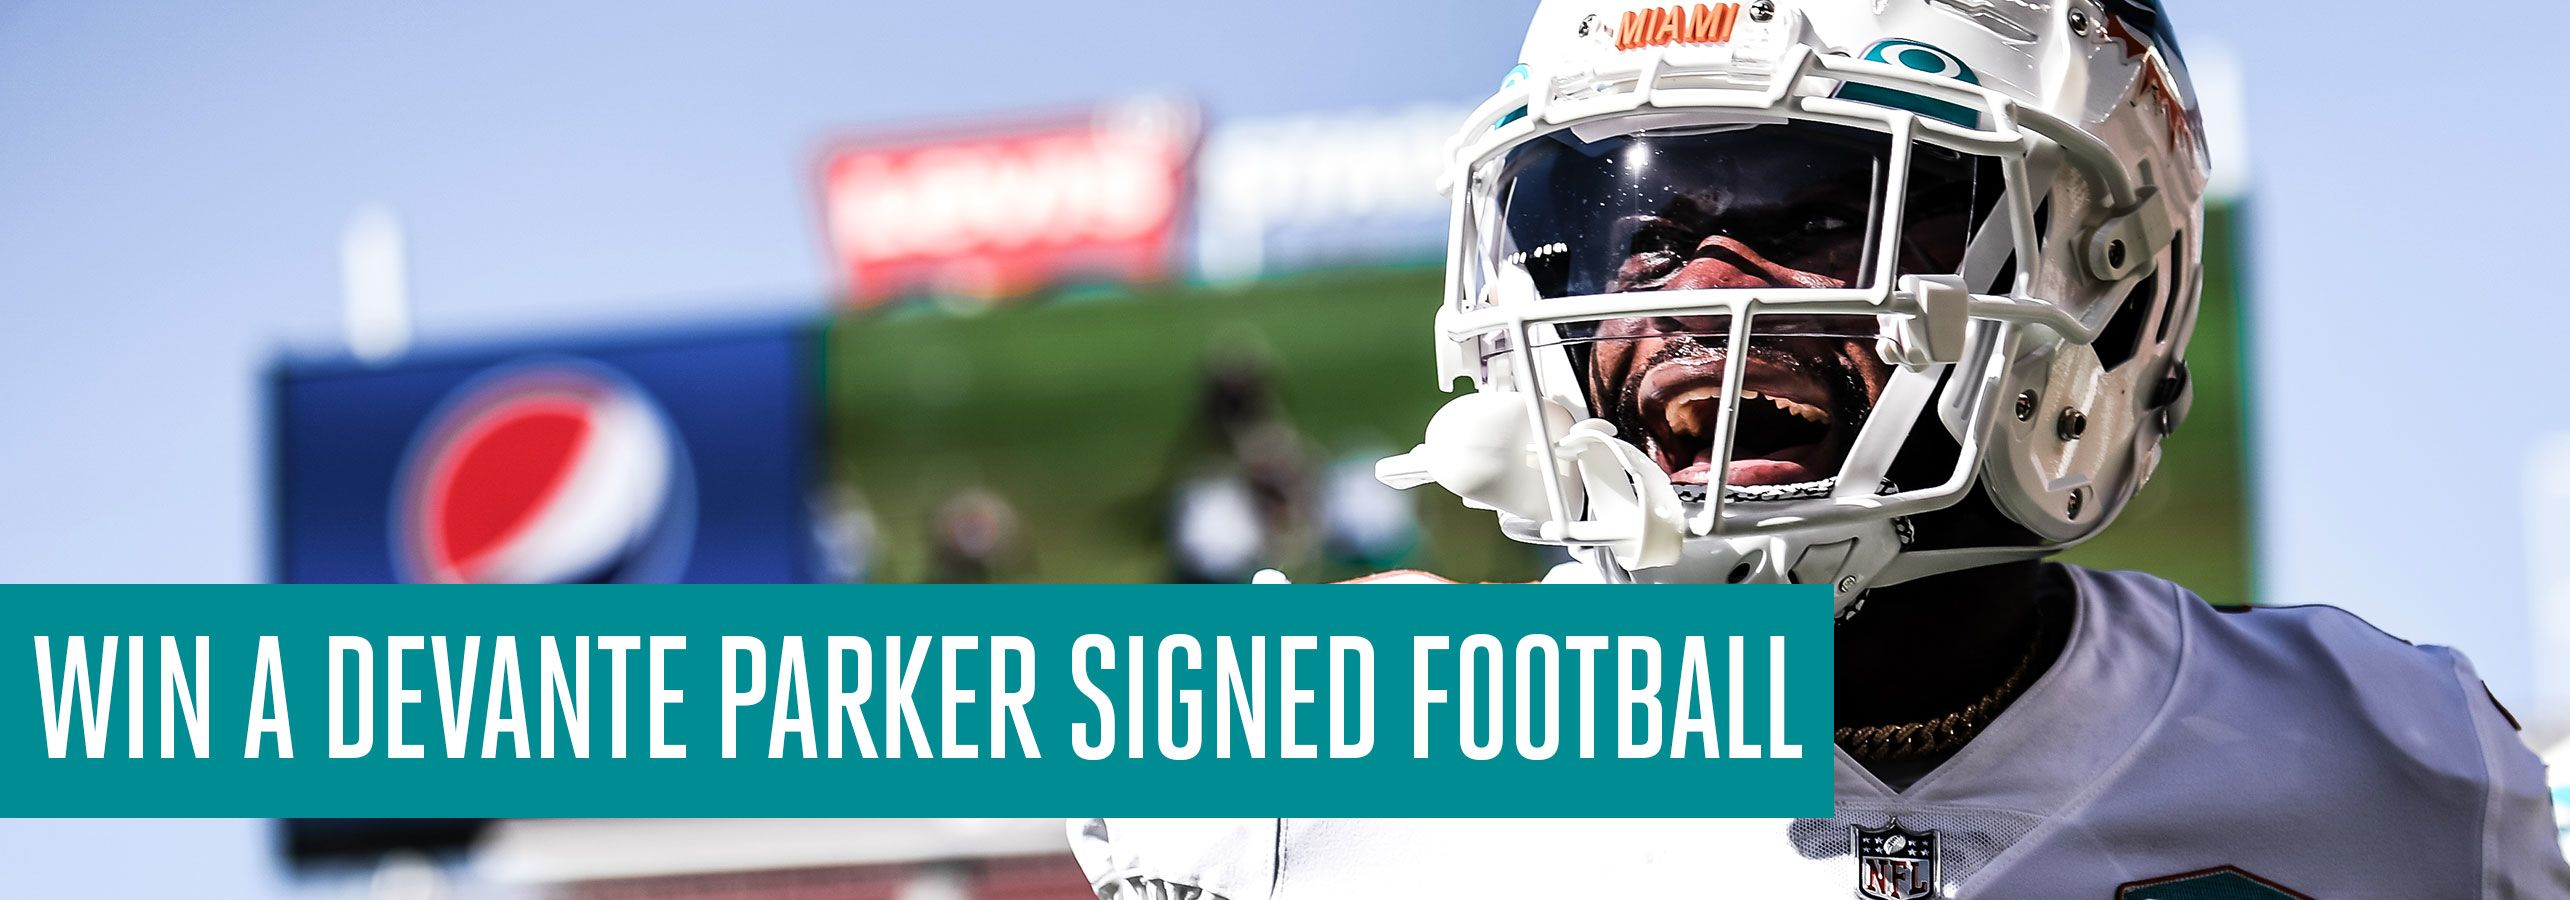 Devante Parker_Signed Football